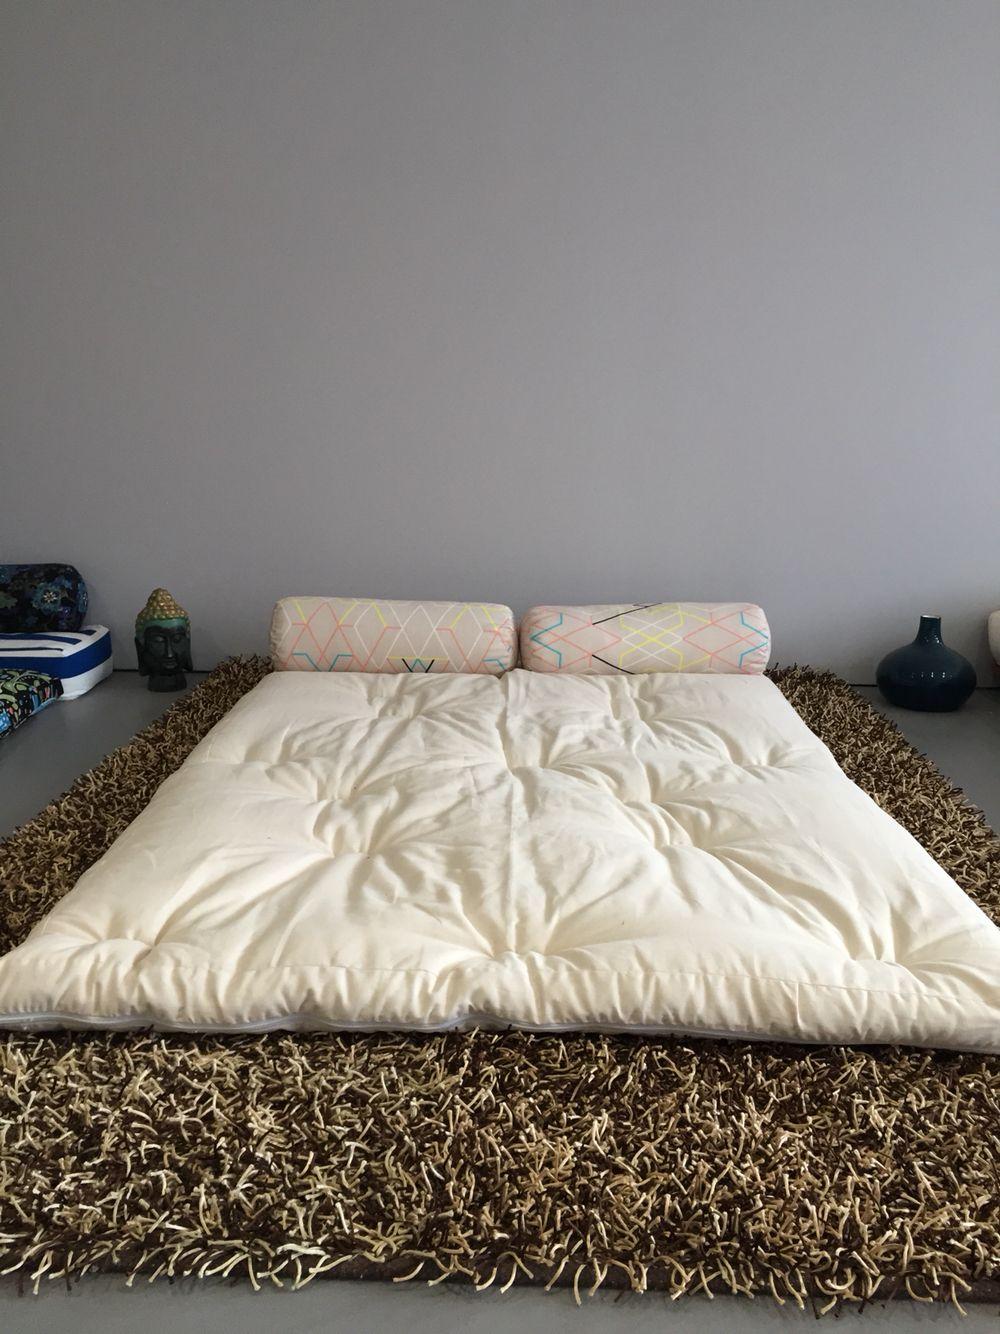 Japanese futon bed frame - Traditional Japanese Futon 100 Cotton Hand Made Aus Futons